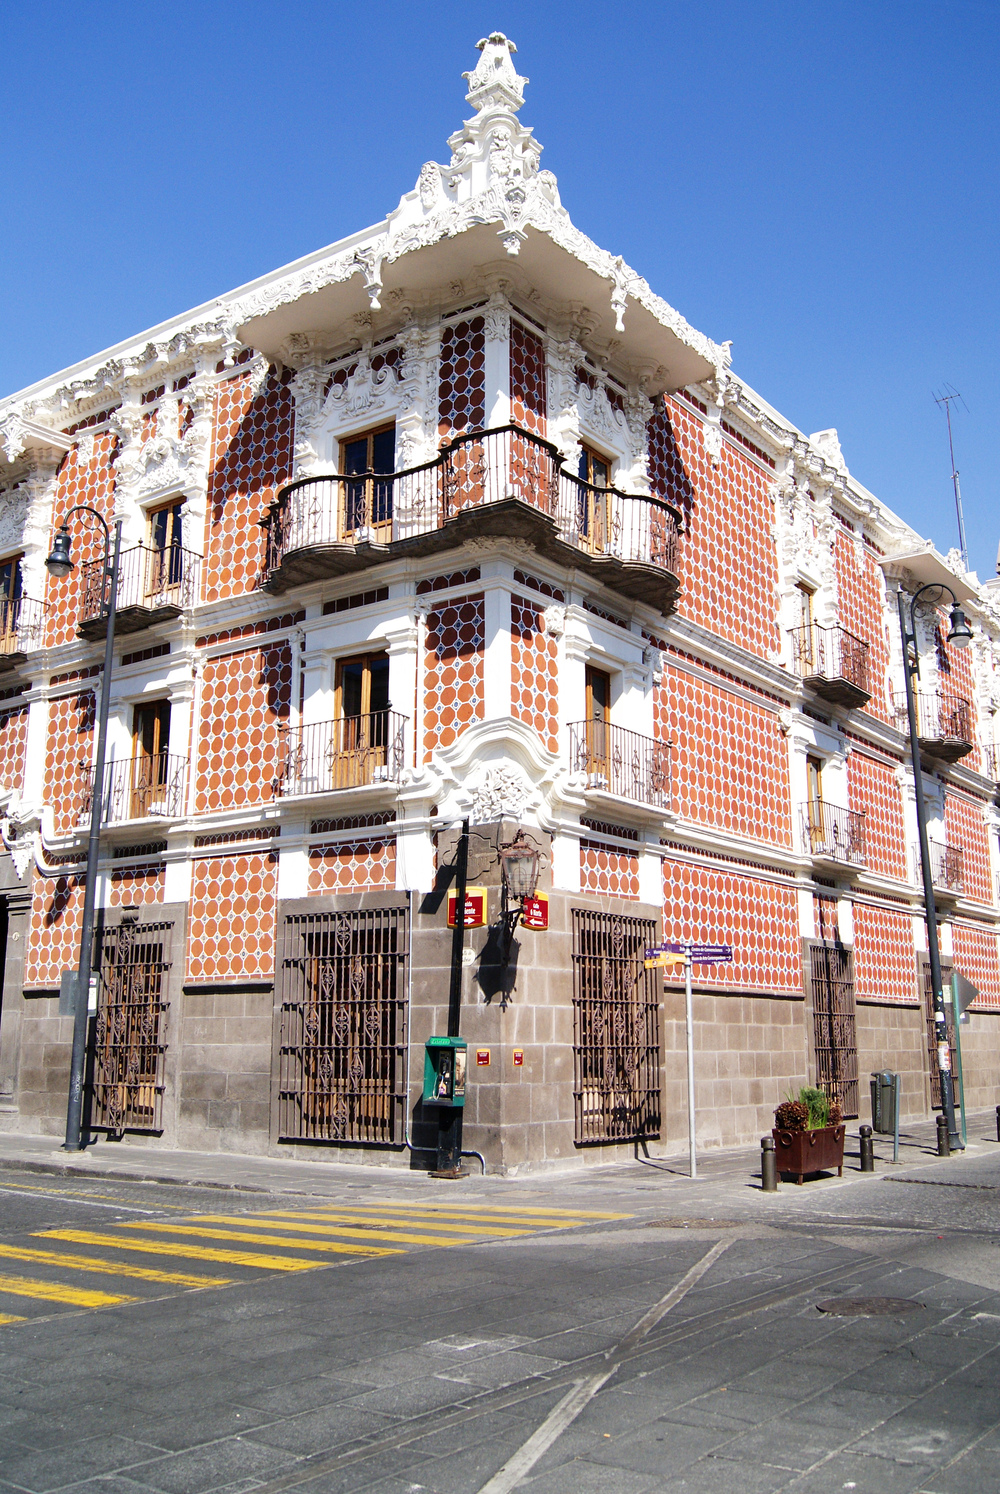 Street in Puebla